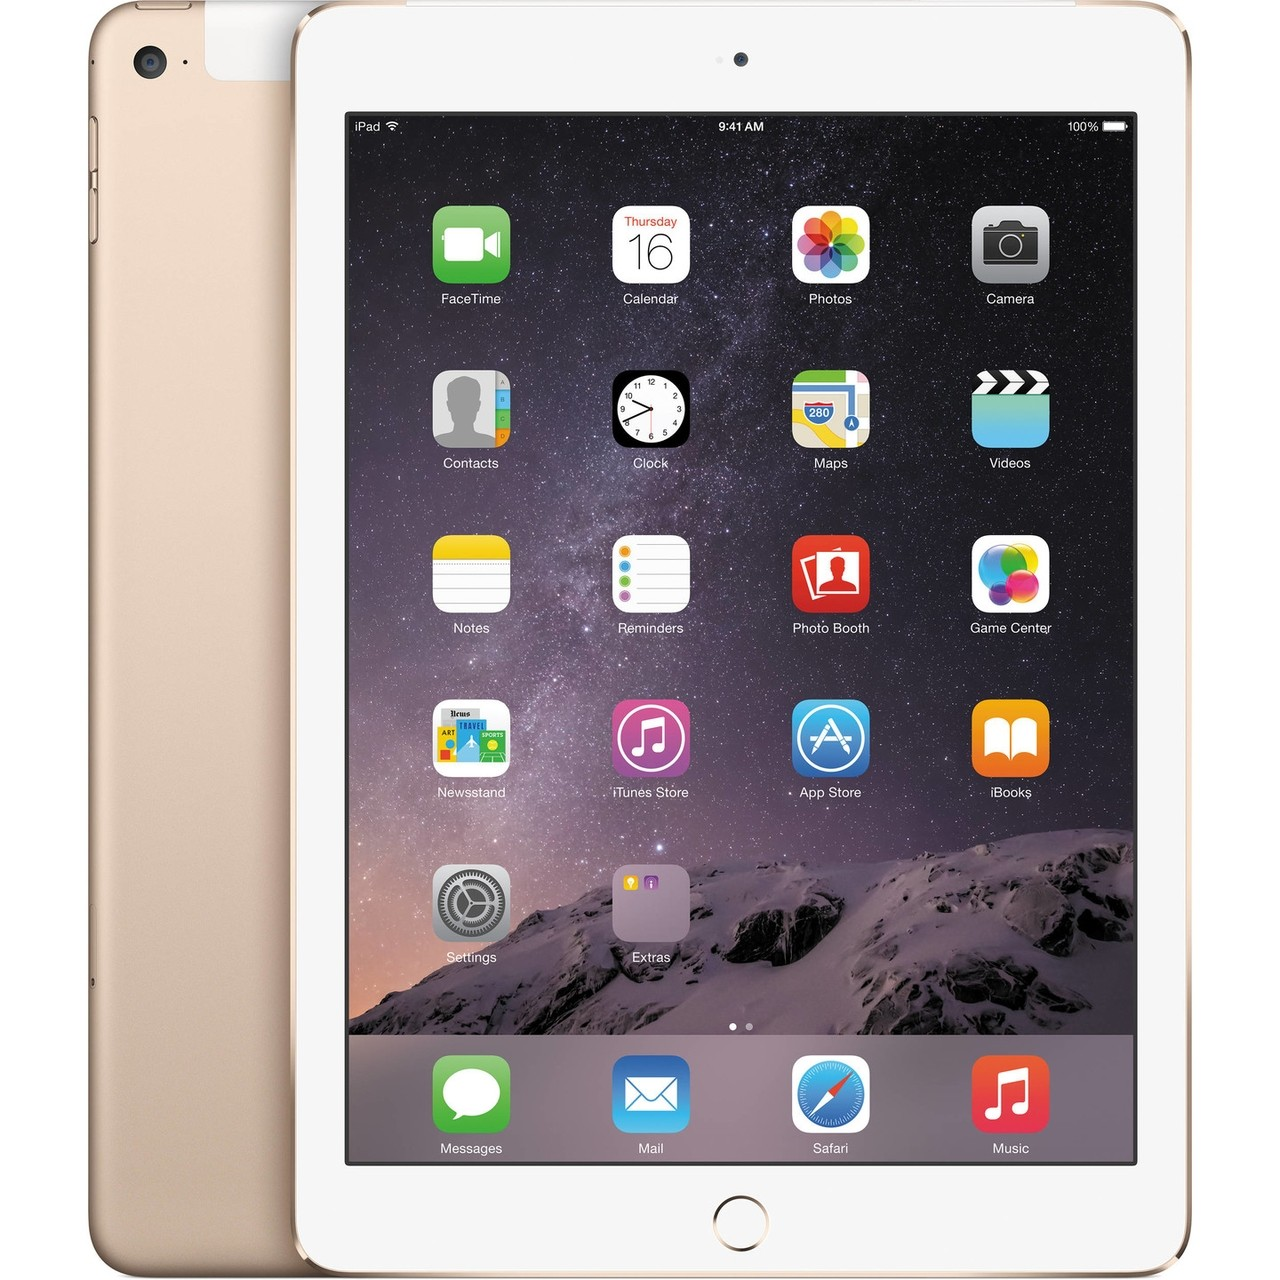 Apple iPad Air 2 - 64GB - 4G - Gold - (Retina Display) - B Grade Tweedehands